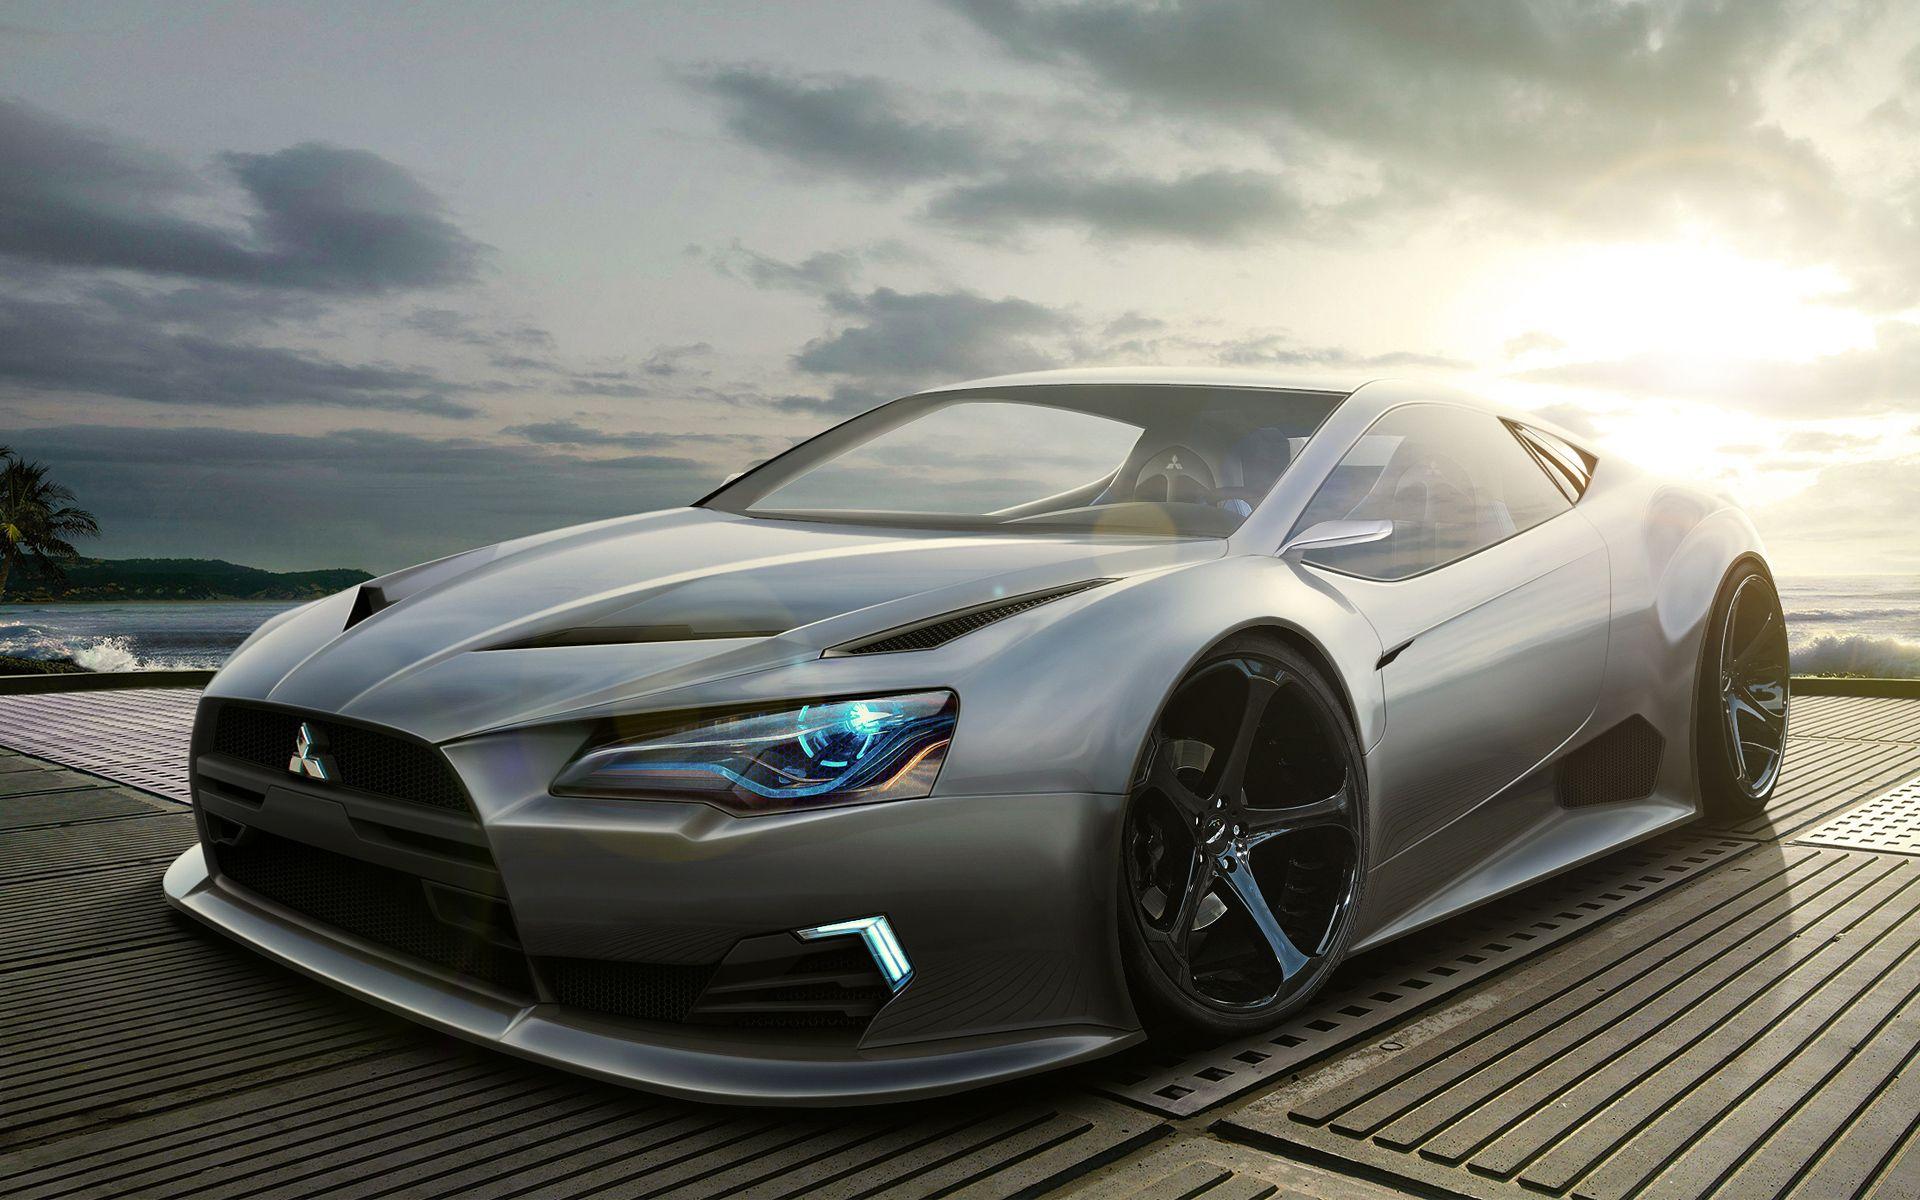 Hd wallpaper car - Awesome Mitsubishi Concept Car Hd Wallpapers